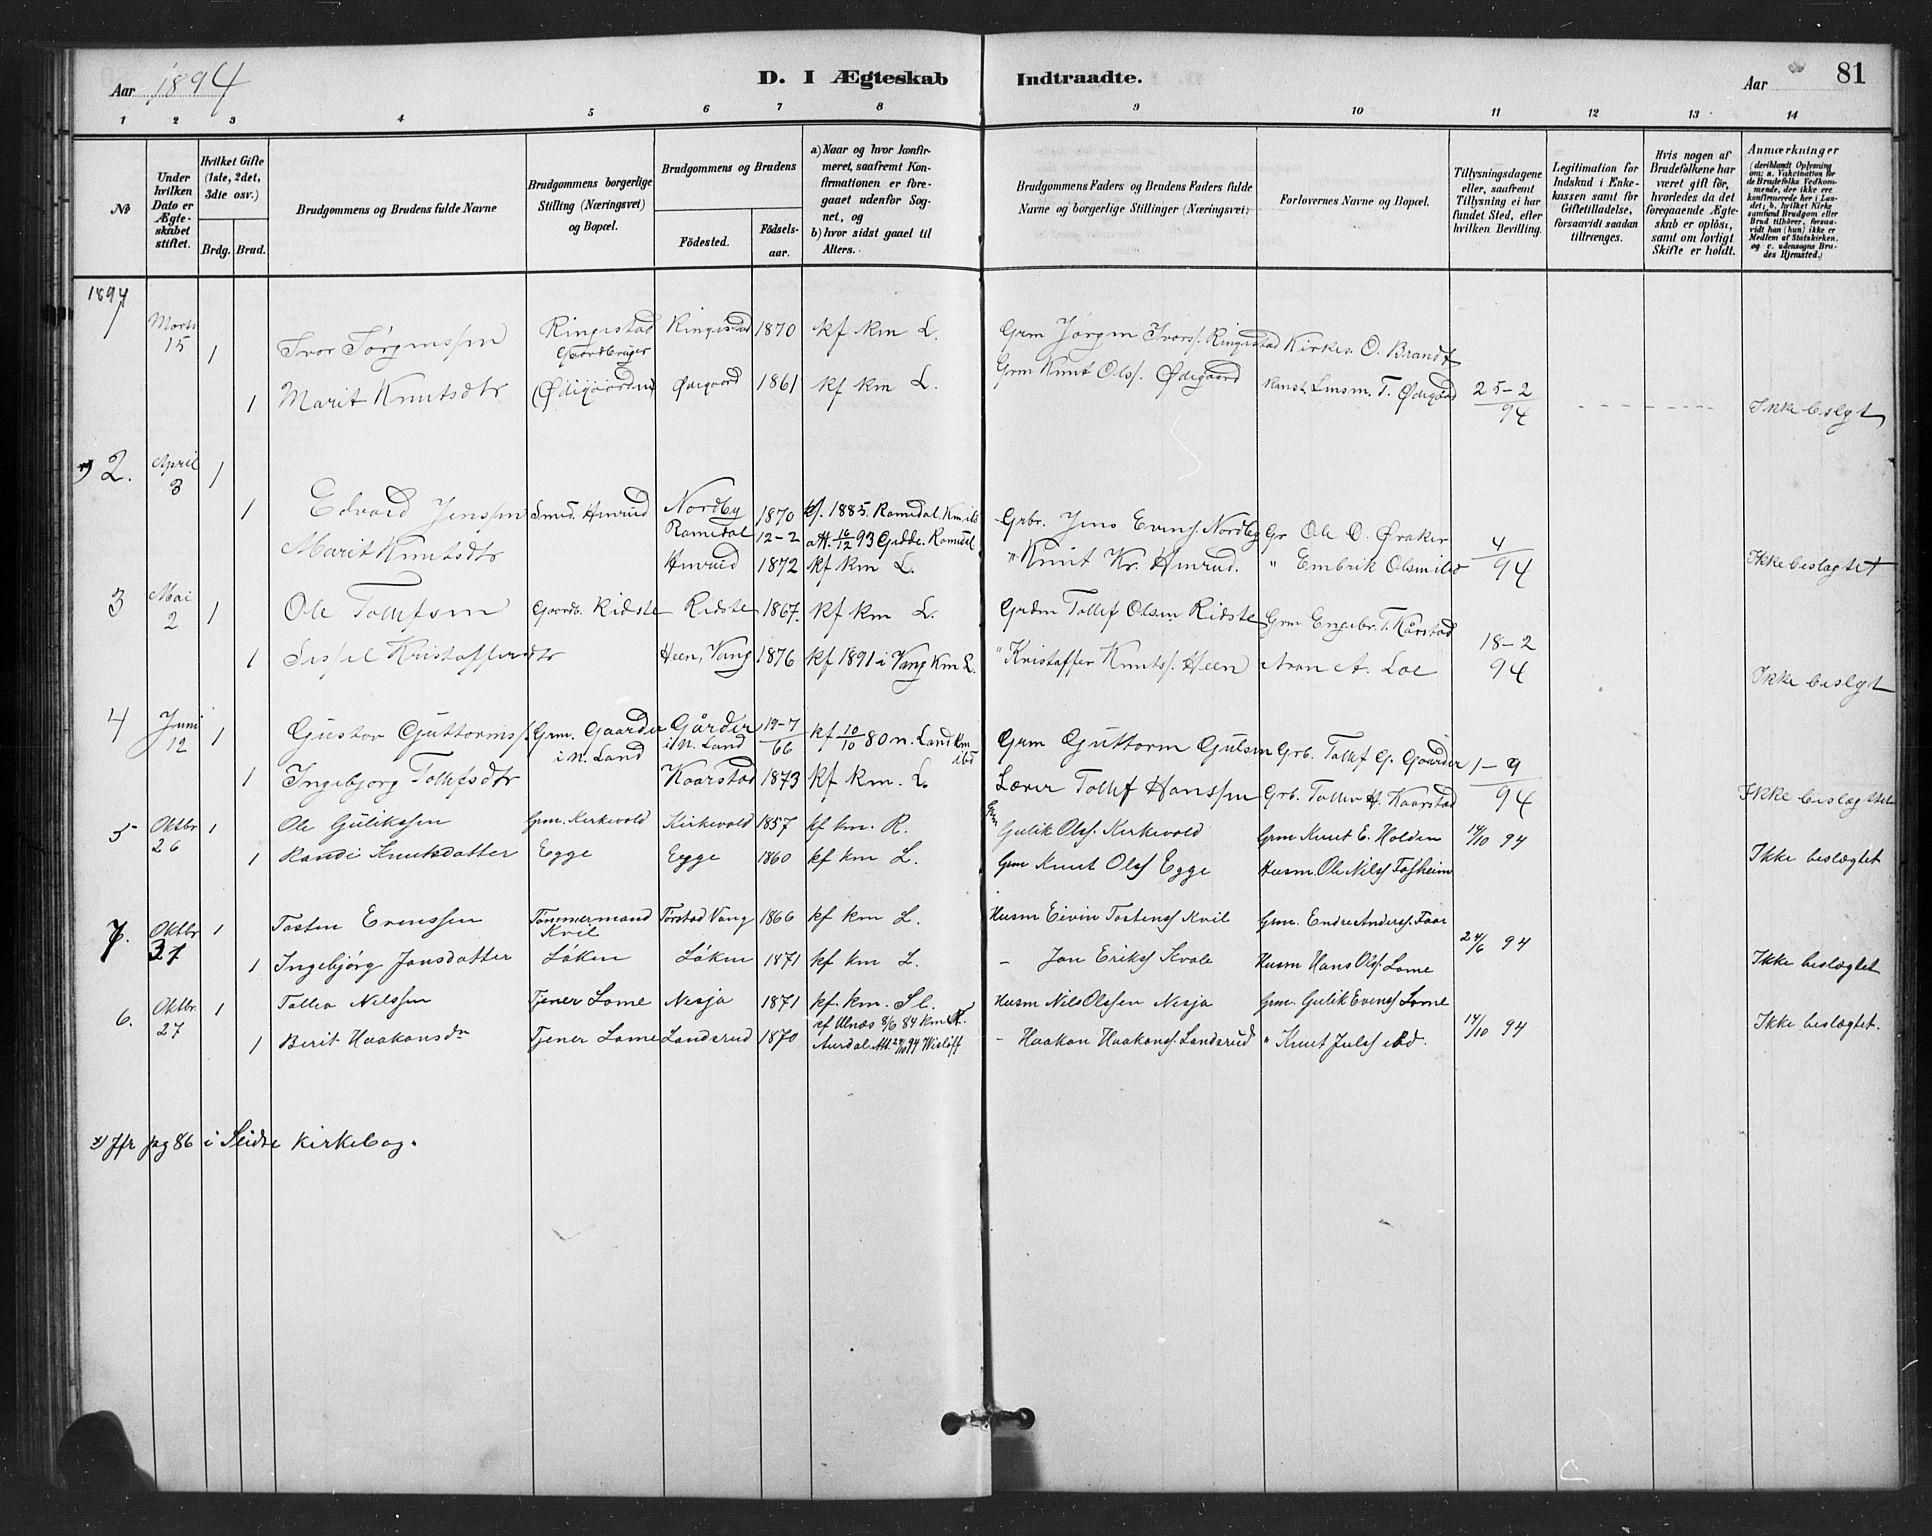 SAH, Vestre Slidre prestekontor, Klokkerbok nr. 6, 1881-1915, s. 81